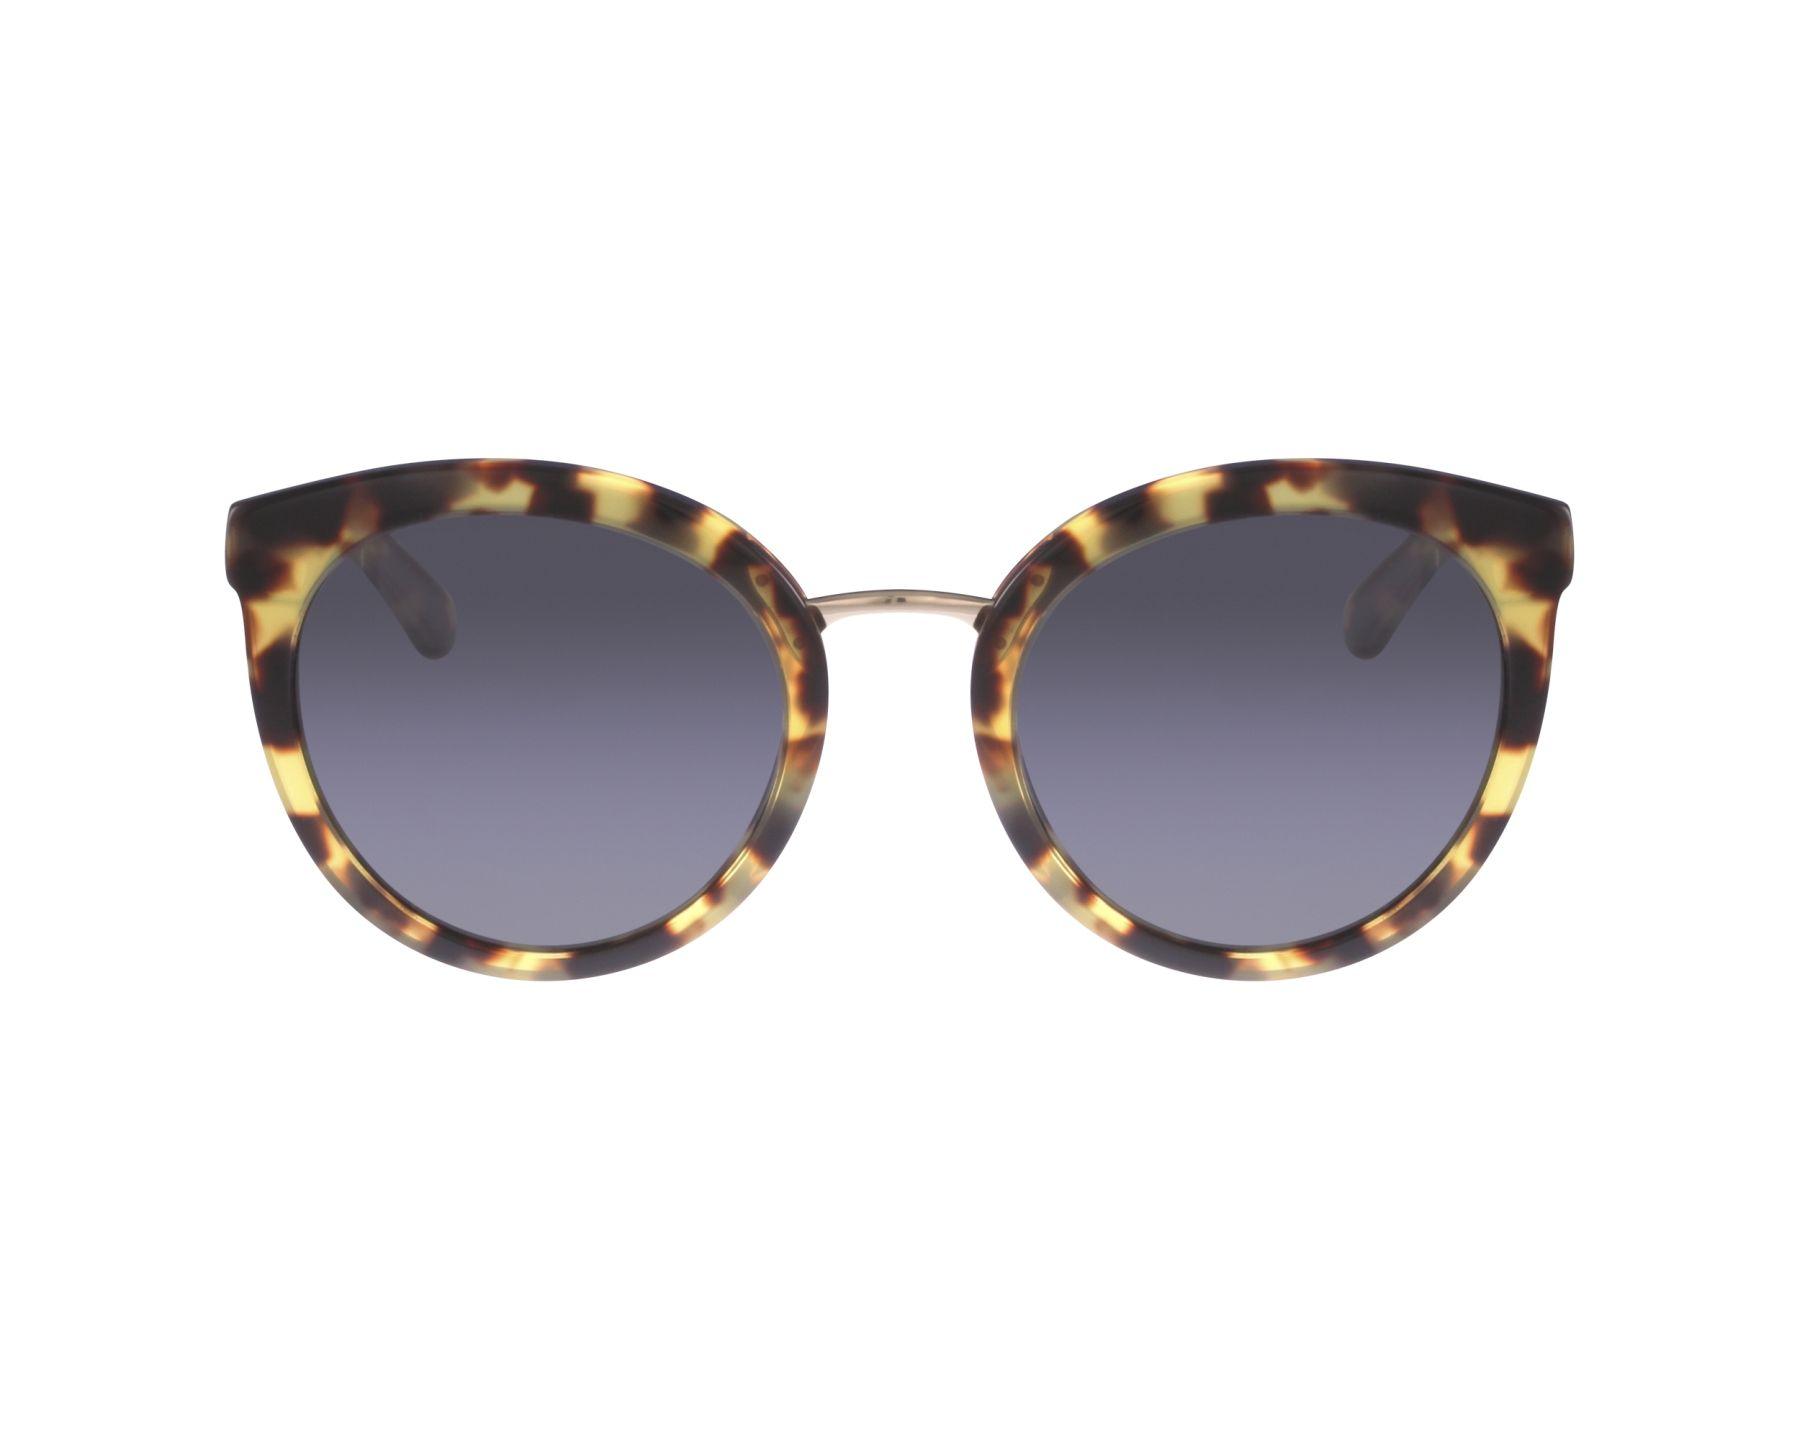 4254f43b6b thumbnail Sunglasses Dolce   Gabbana DG-4268 512 87 - Havana Gold profile  view